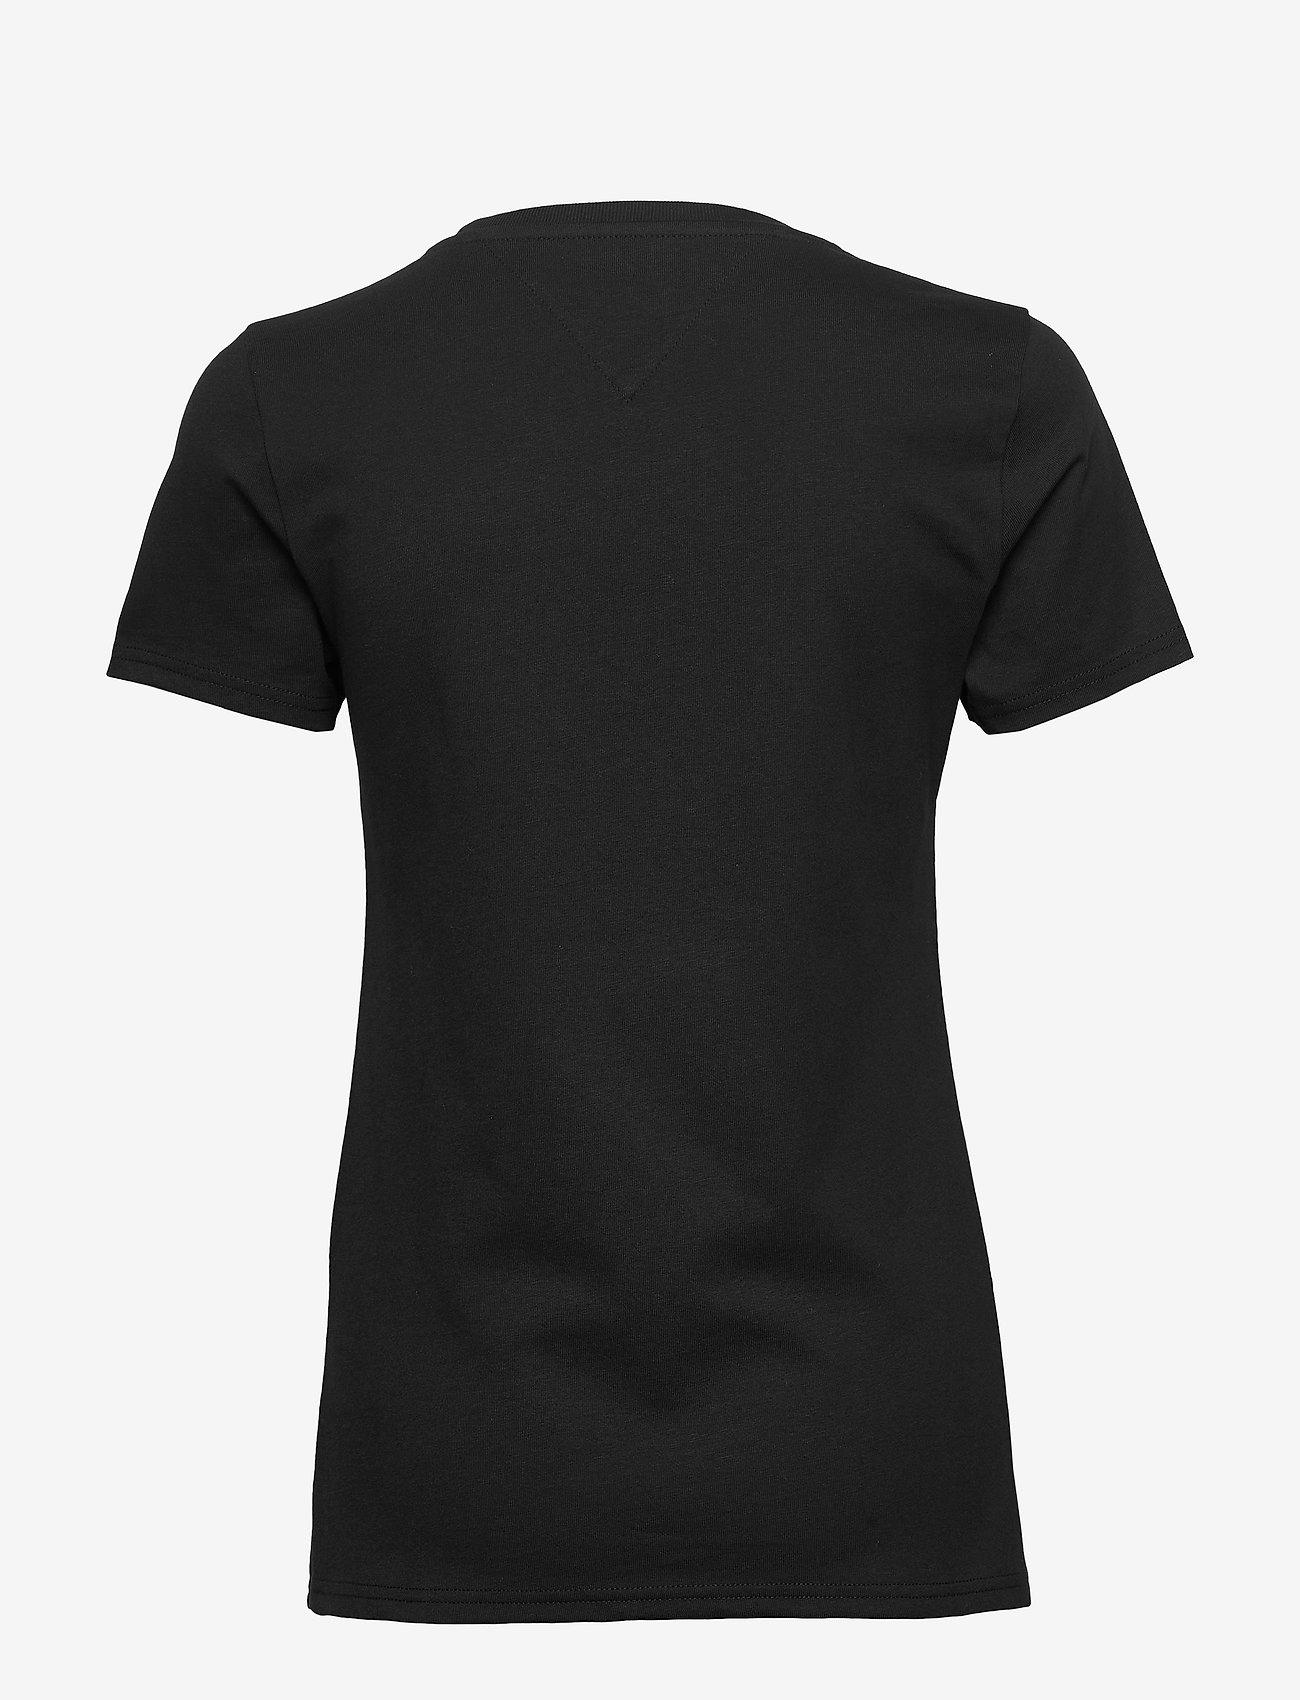 Tommy Jeans - TJW METALLIC OUTLINE FLAG TEE - t-shirts - black - 1